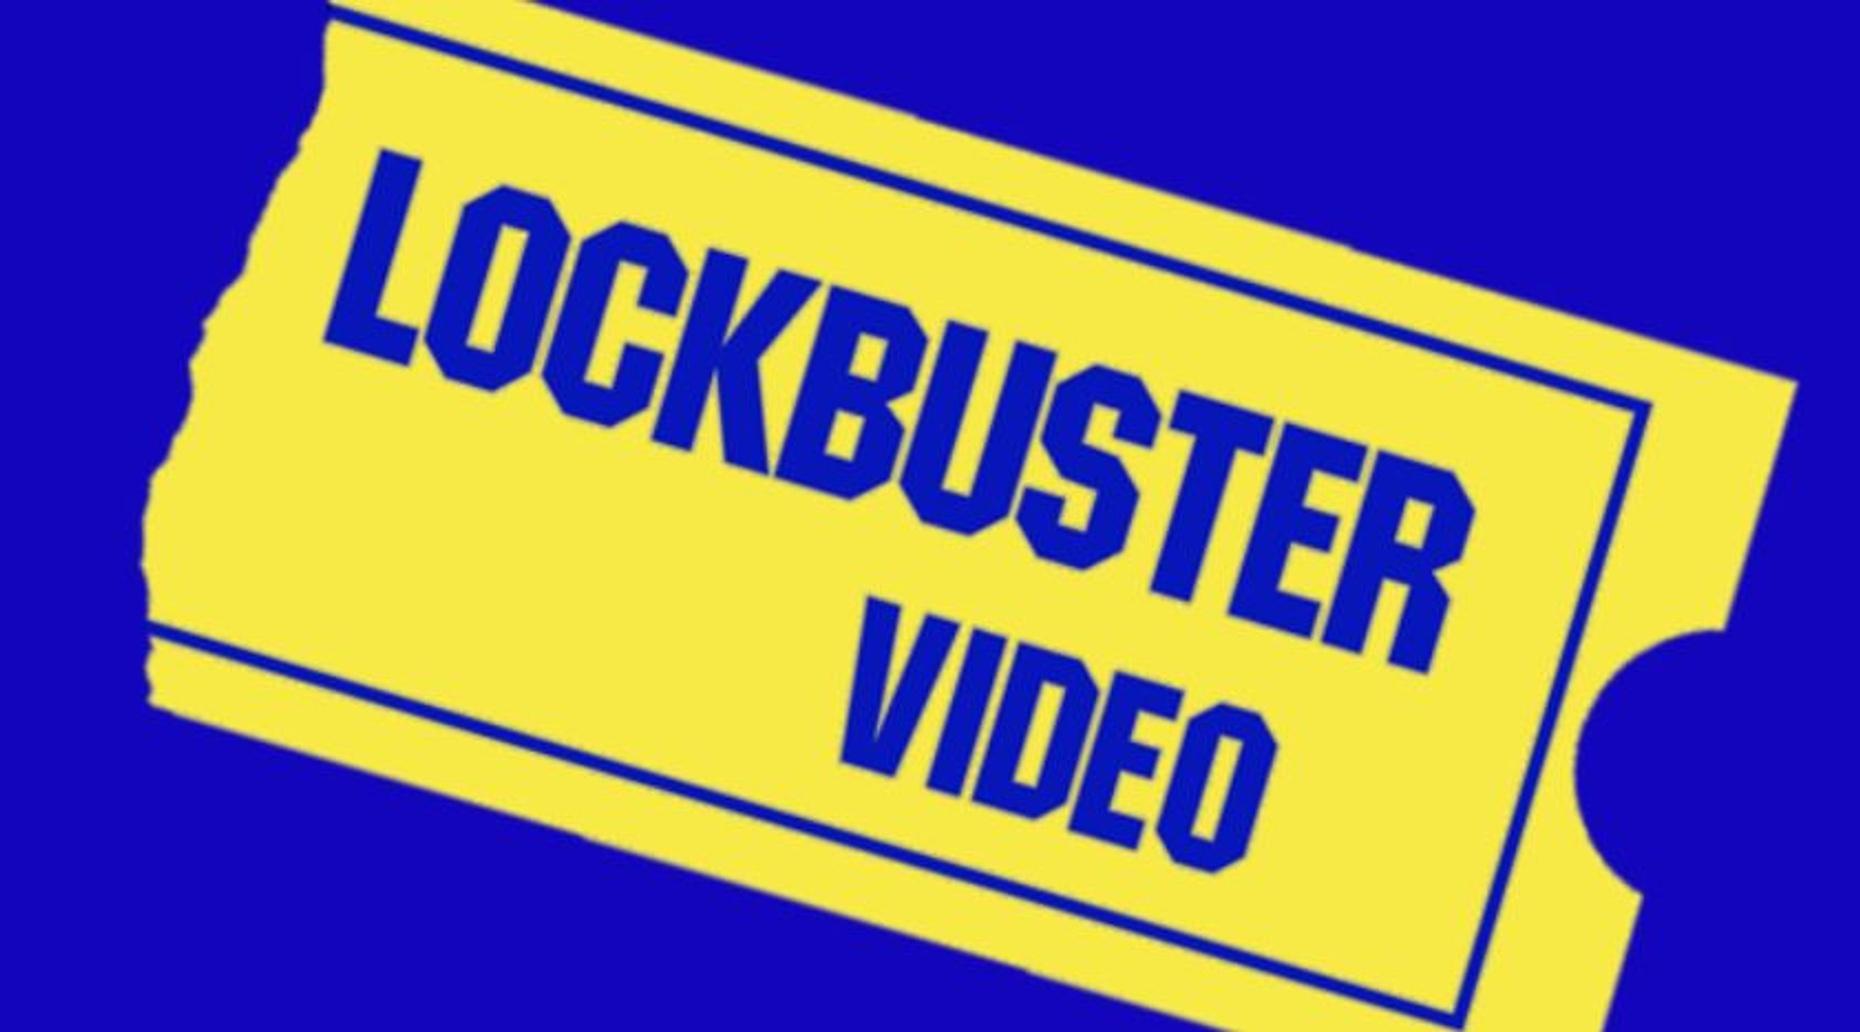 Lockbuster Video Escape Room in Sioux Falls